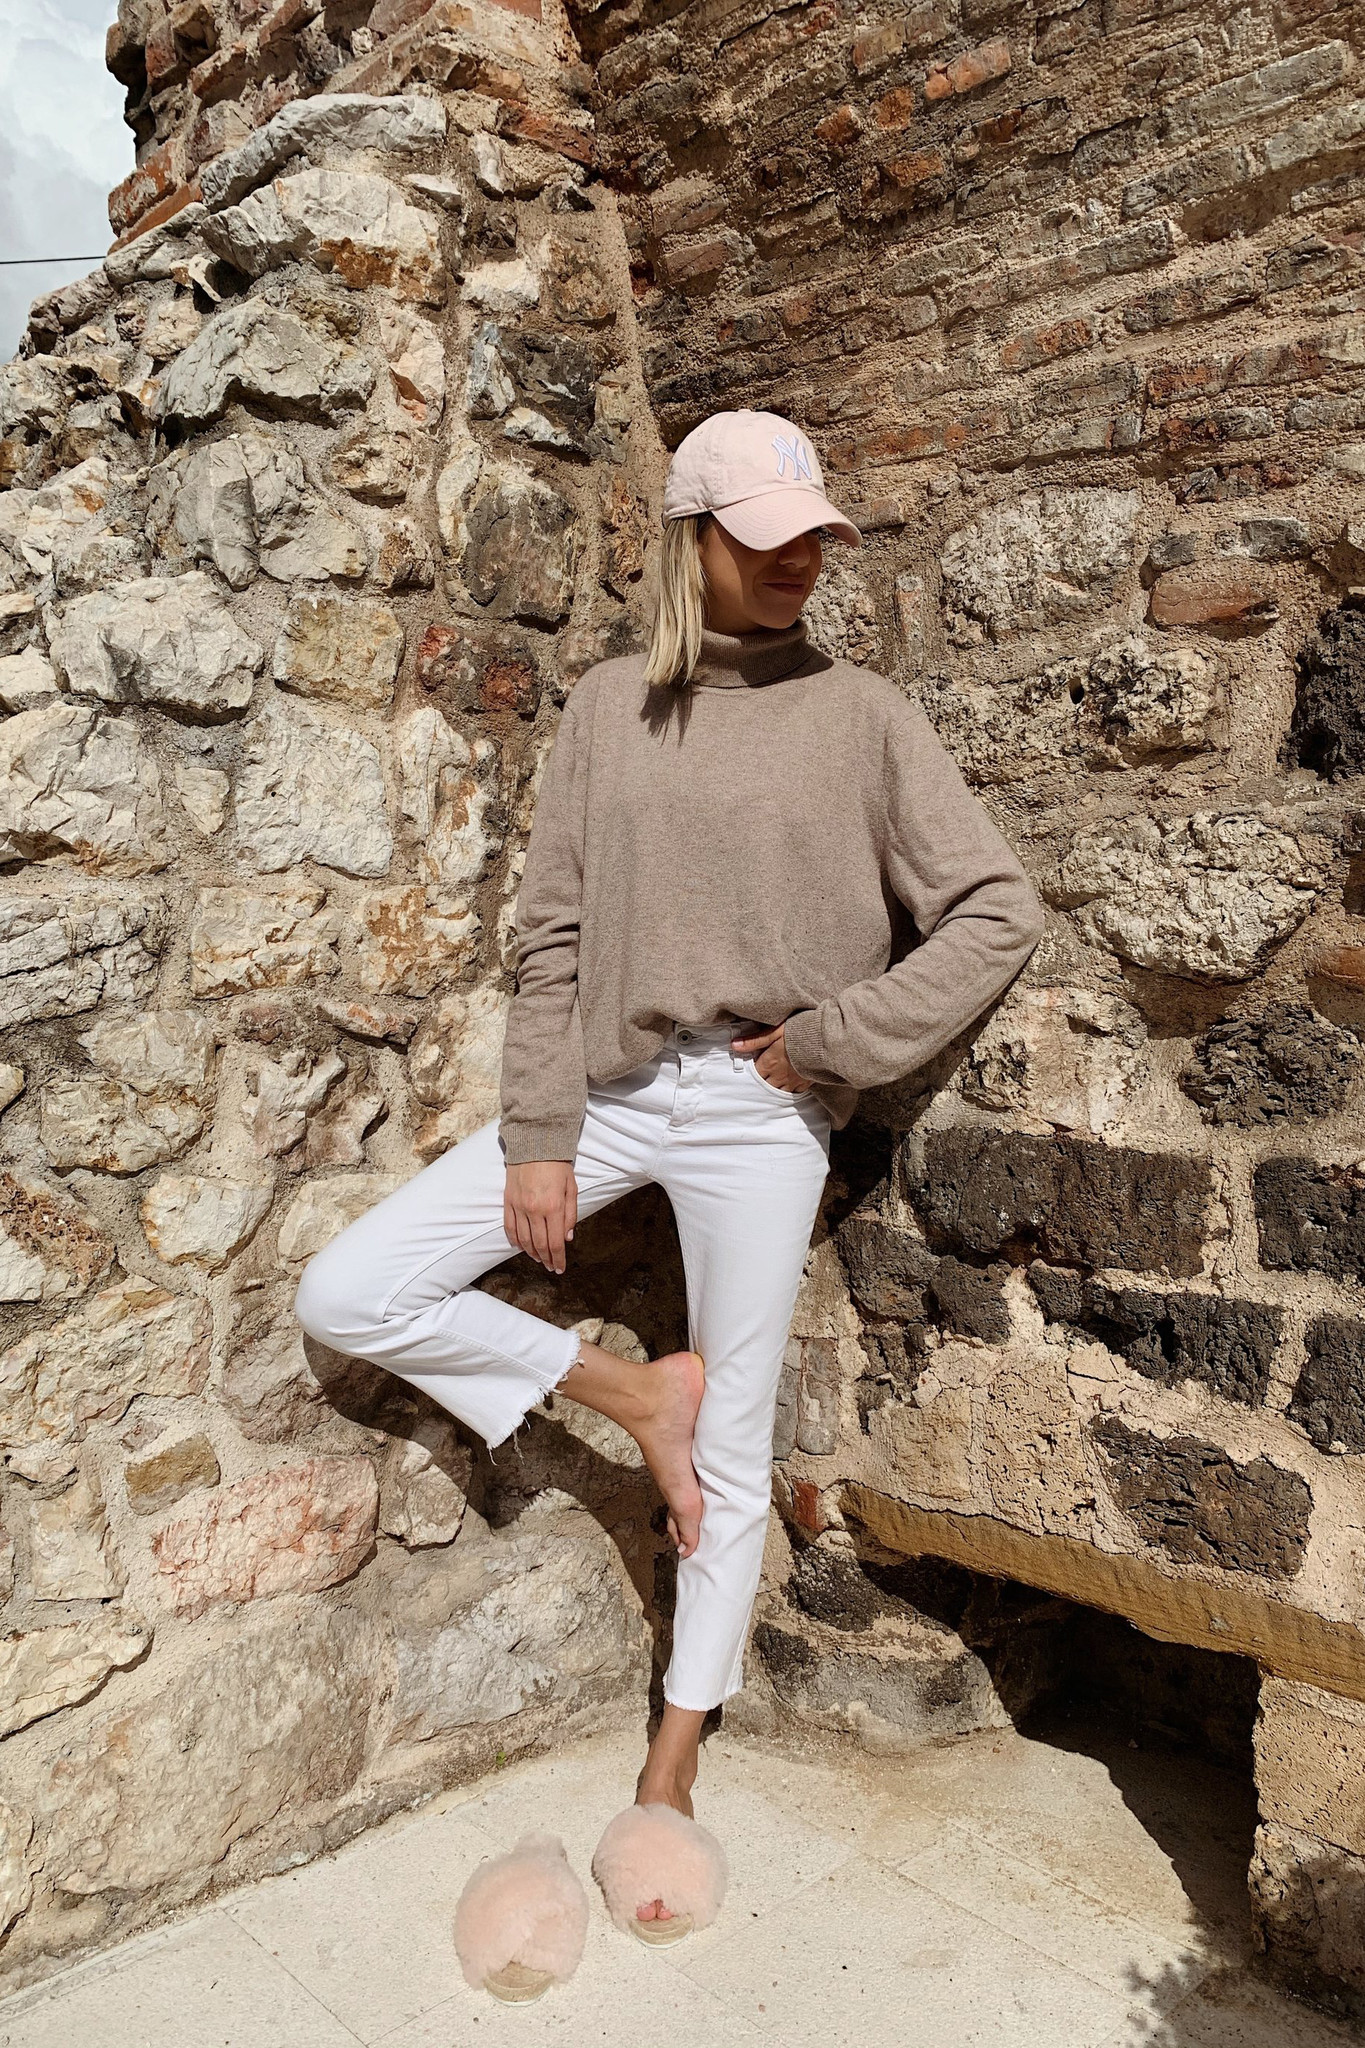 Lori Sheepskin Wool Slippers - Off White-6